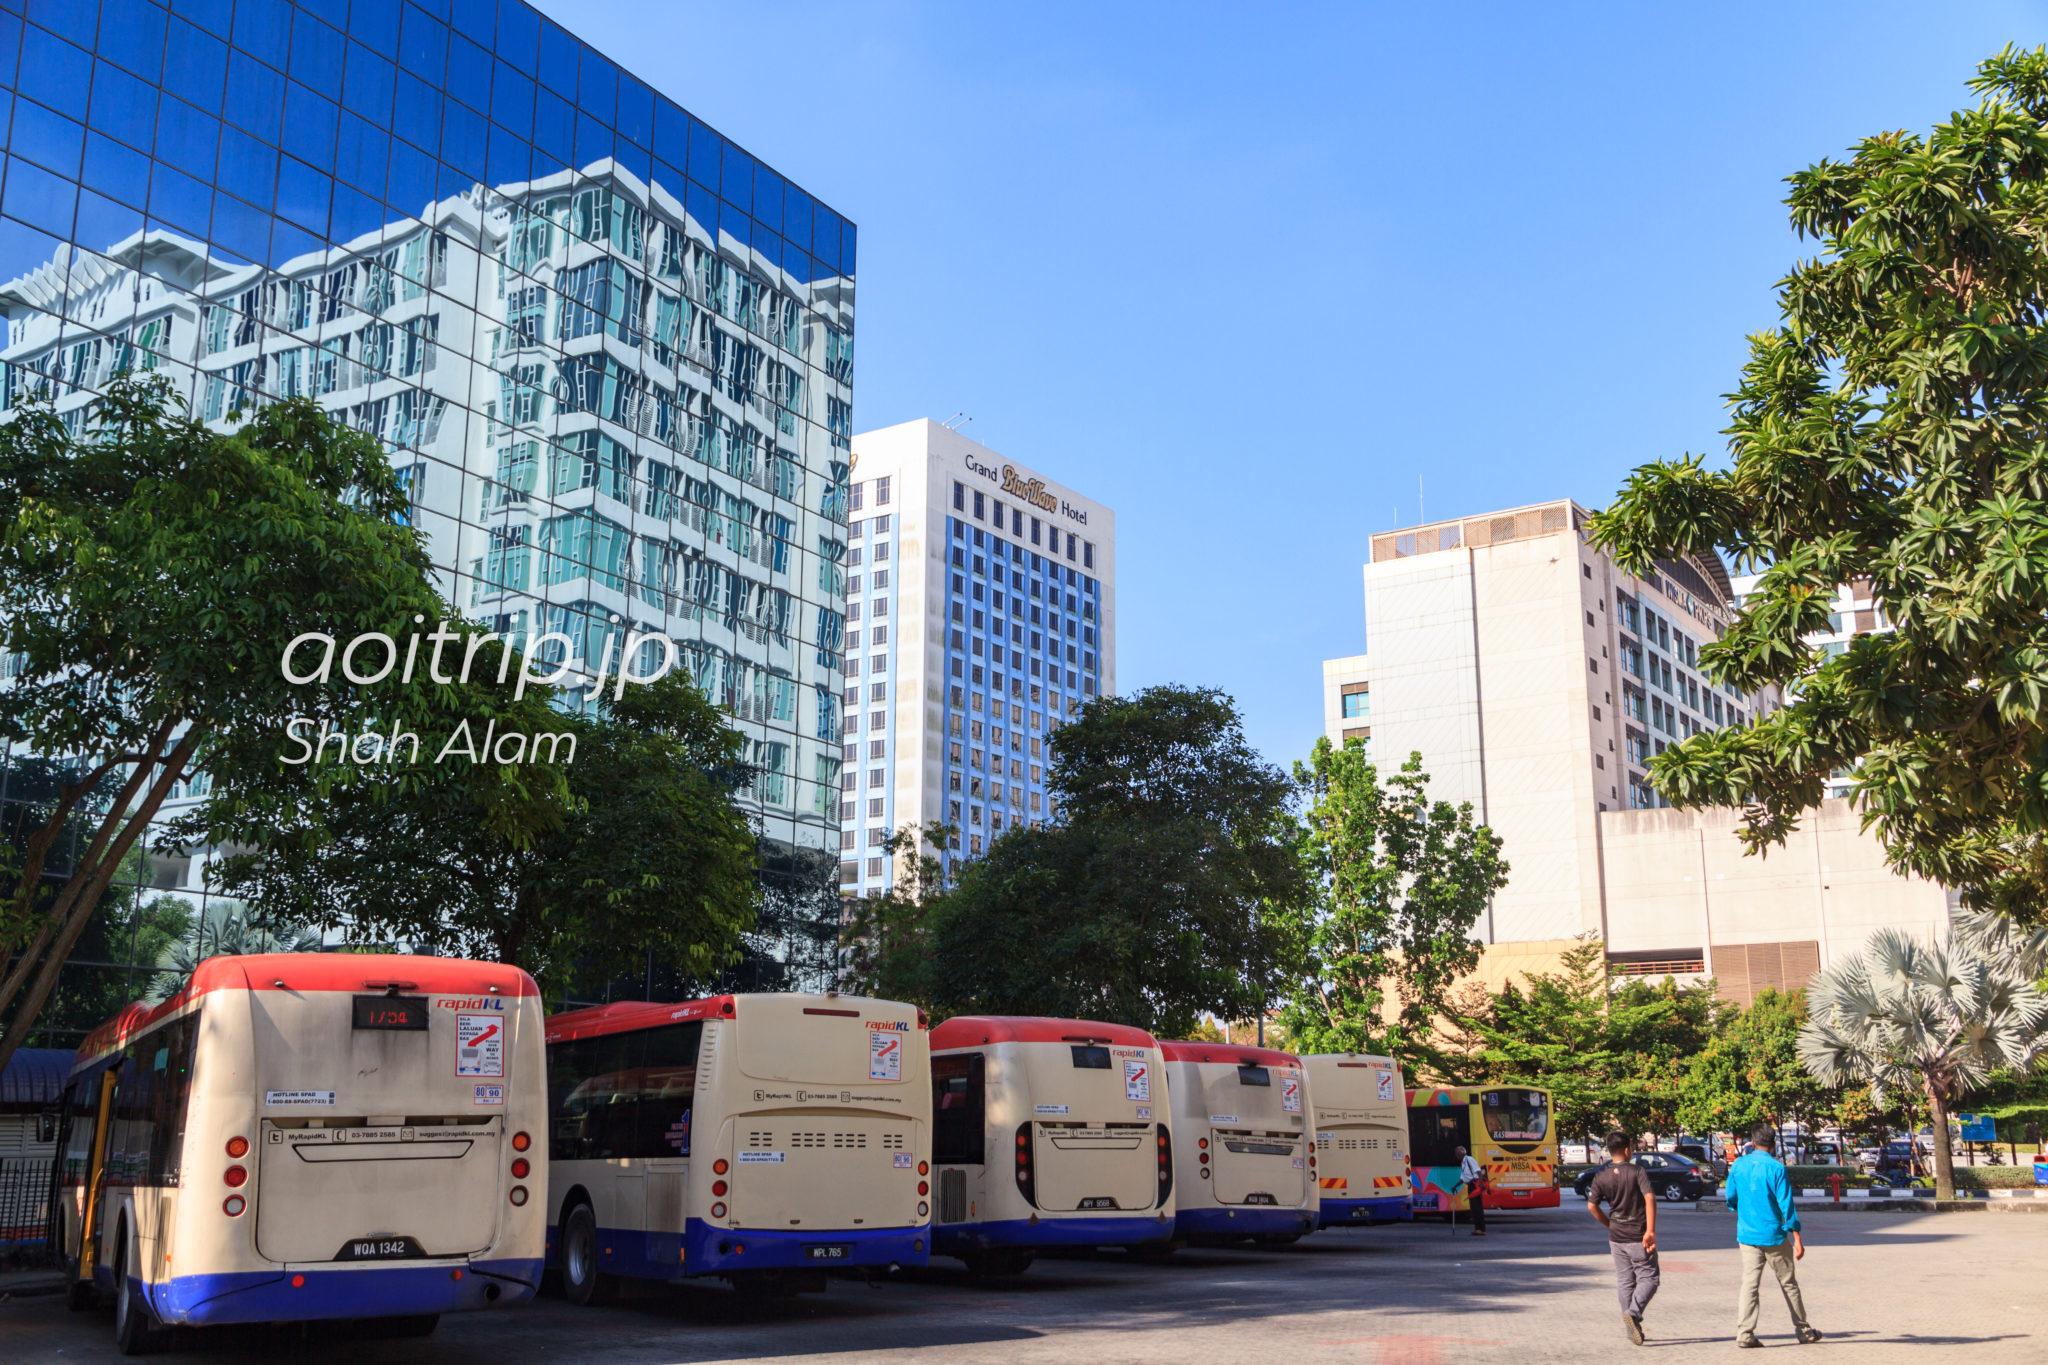 Hentian Pasat Bandar Shah Alam(ブルーモスクの最寄りバスターミナル)